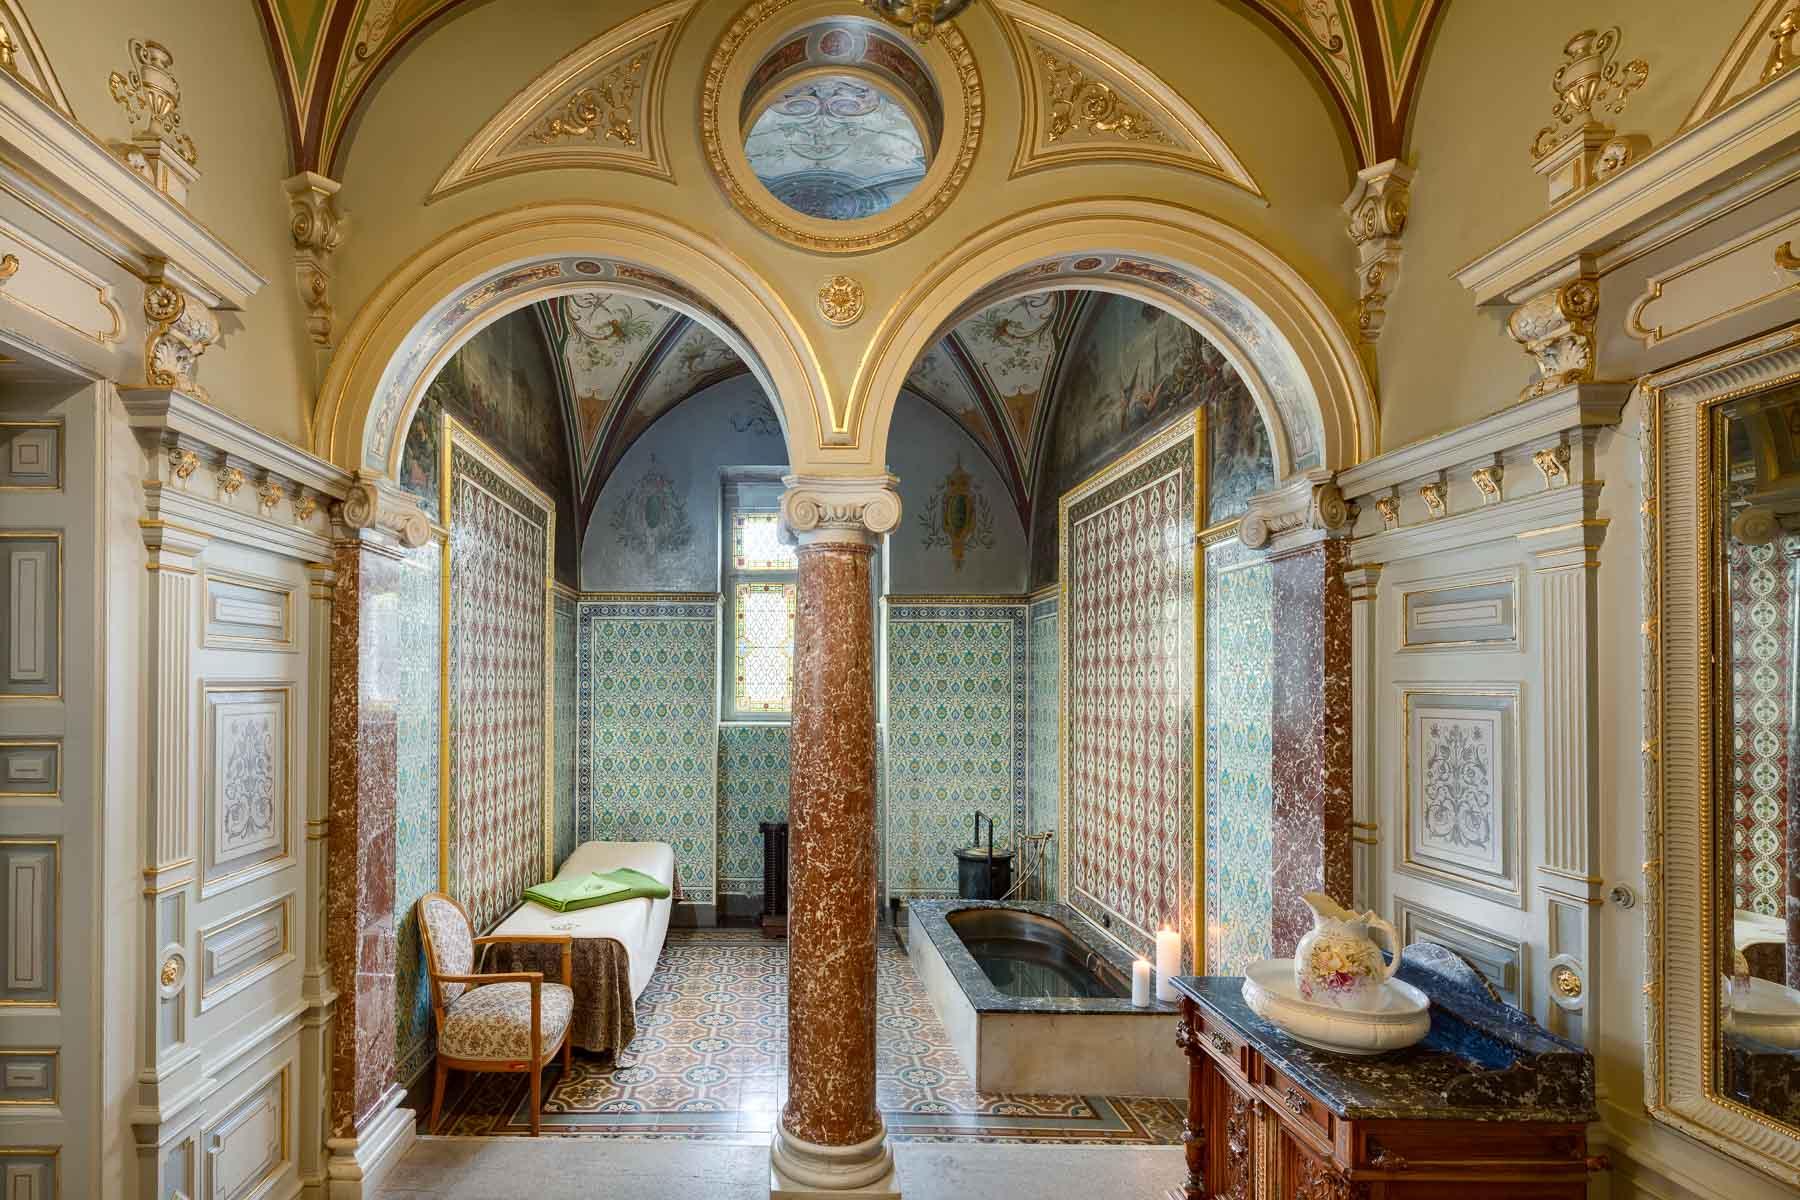 Hotel Nove Lazne, Marienbad, Marianske lazne, Kings cabin, spa